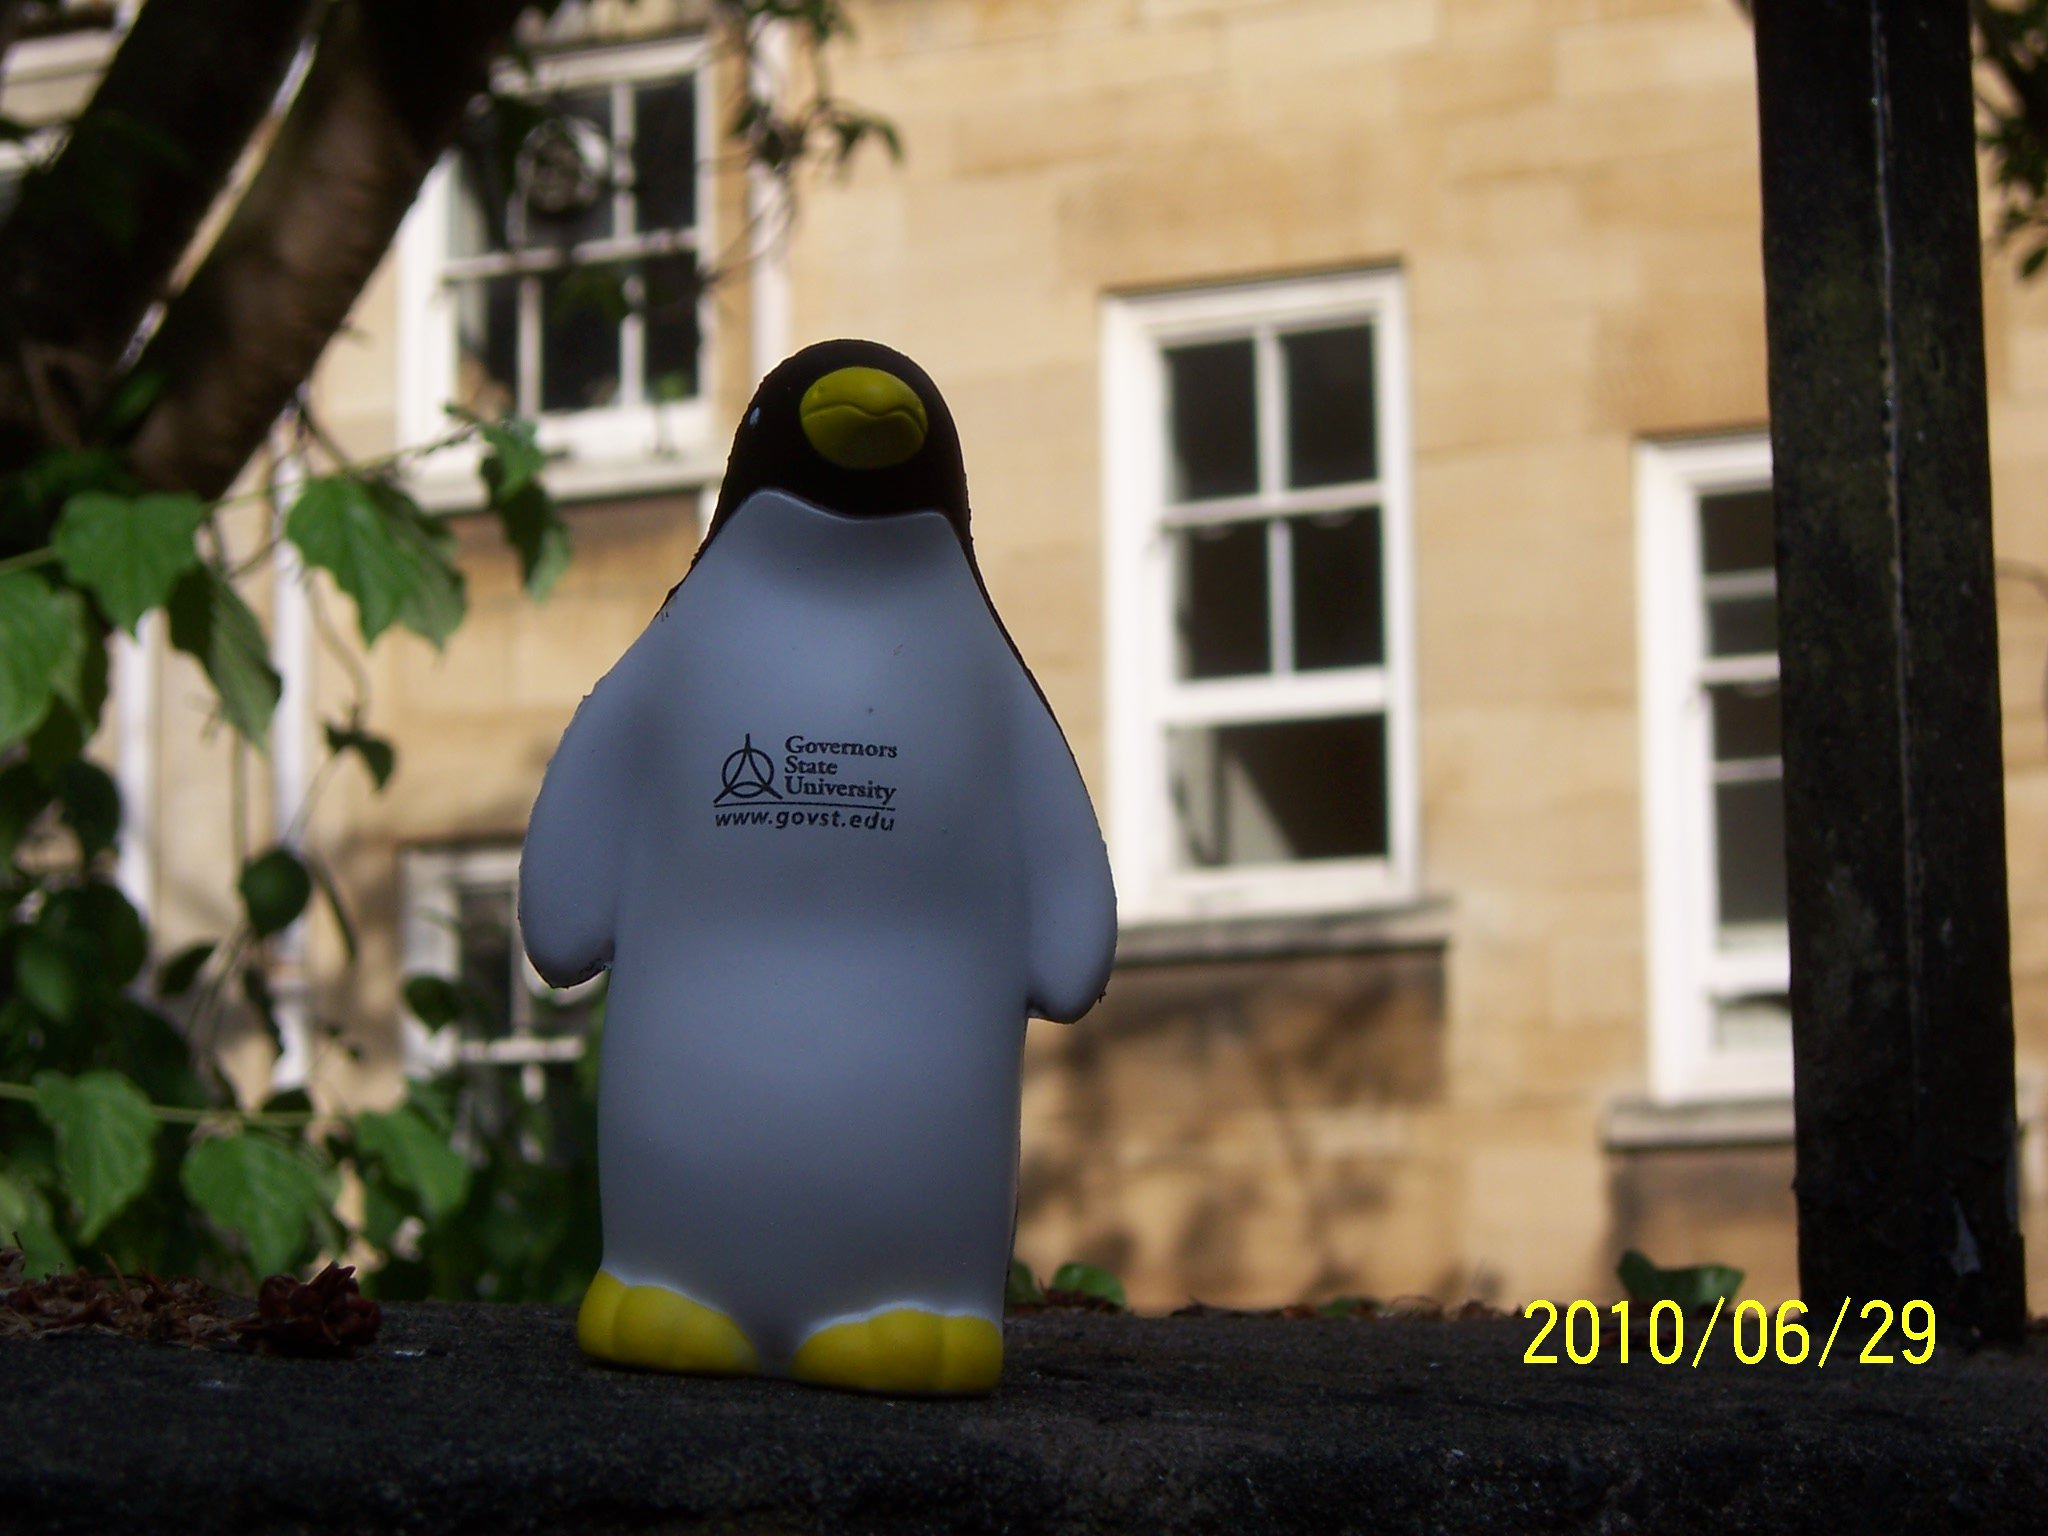 PenguinBristol